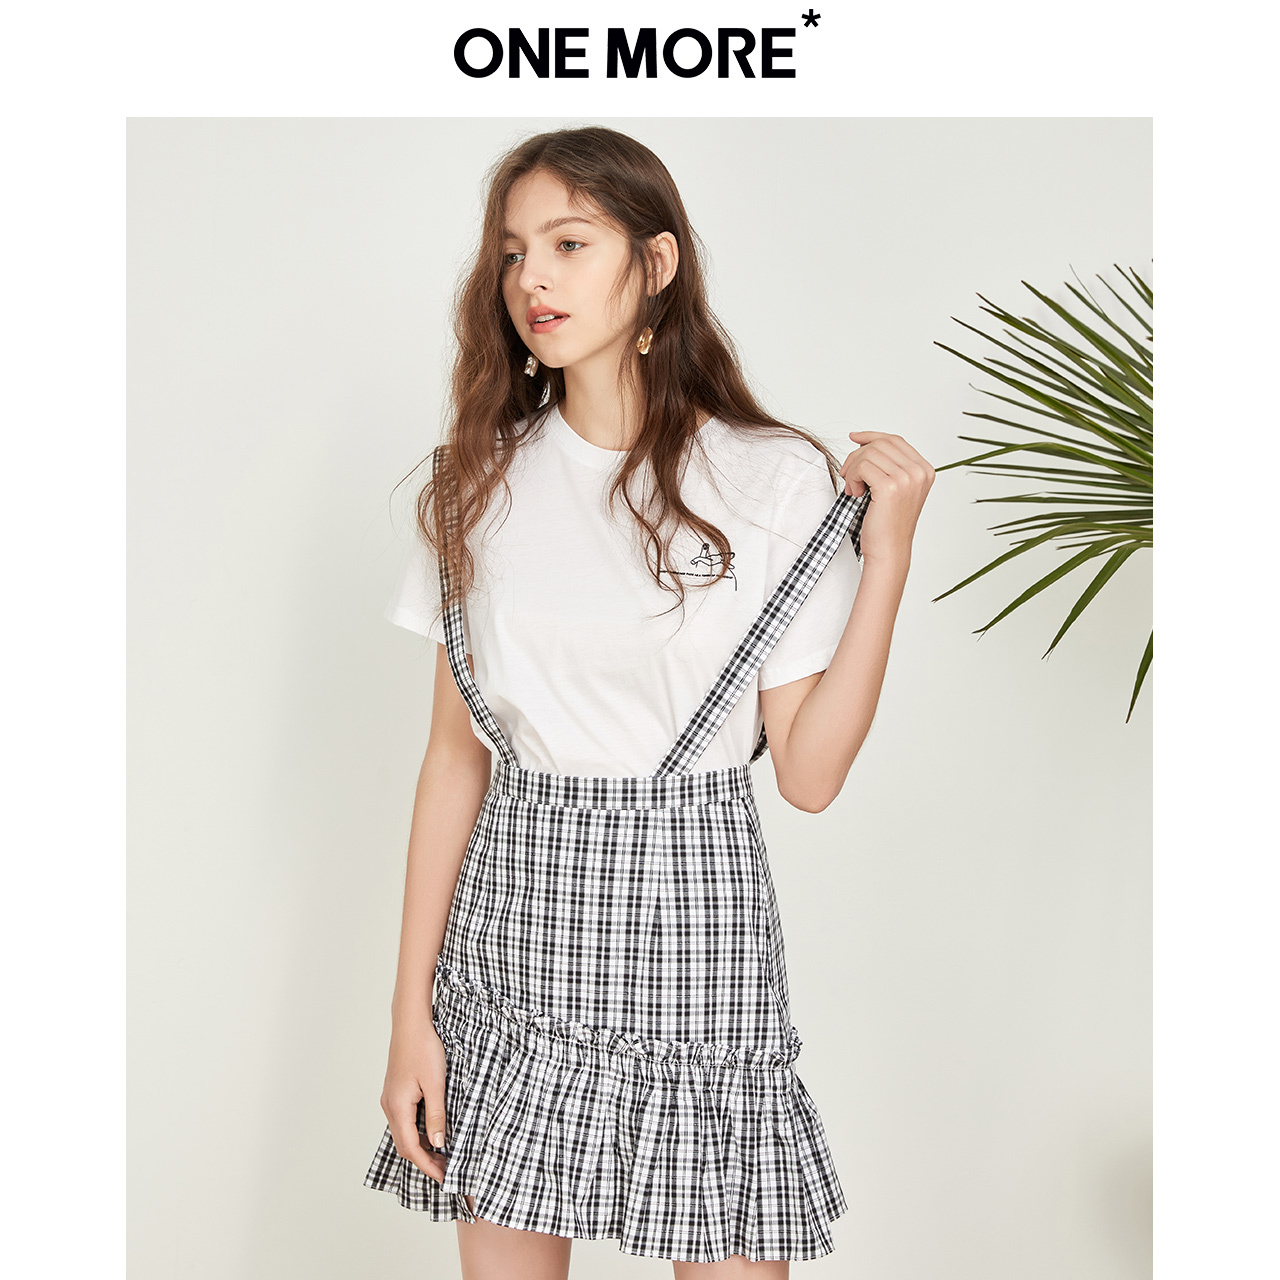 ONE MORE2019夏季新款格纹高腰半身裙韩版显瘦半裙女 79元